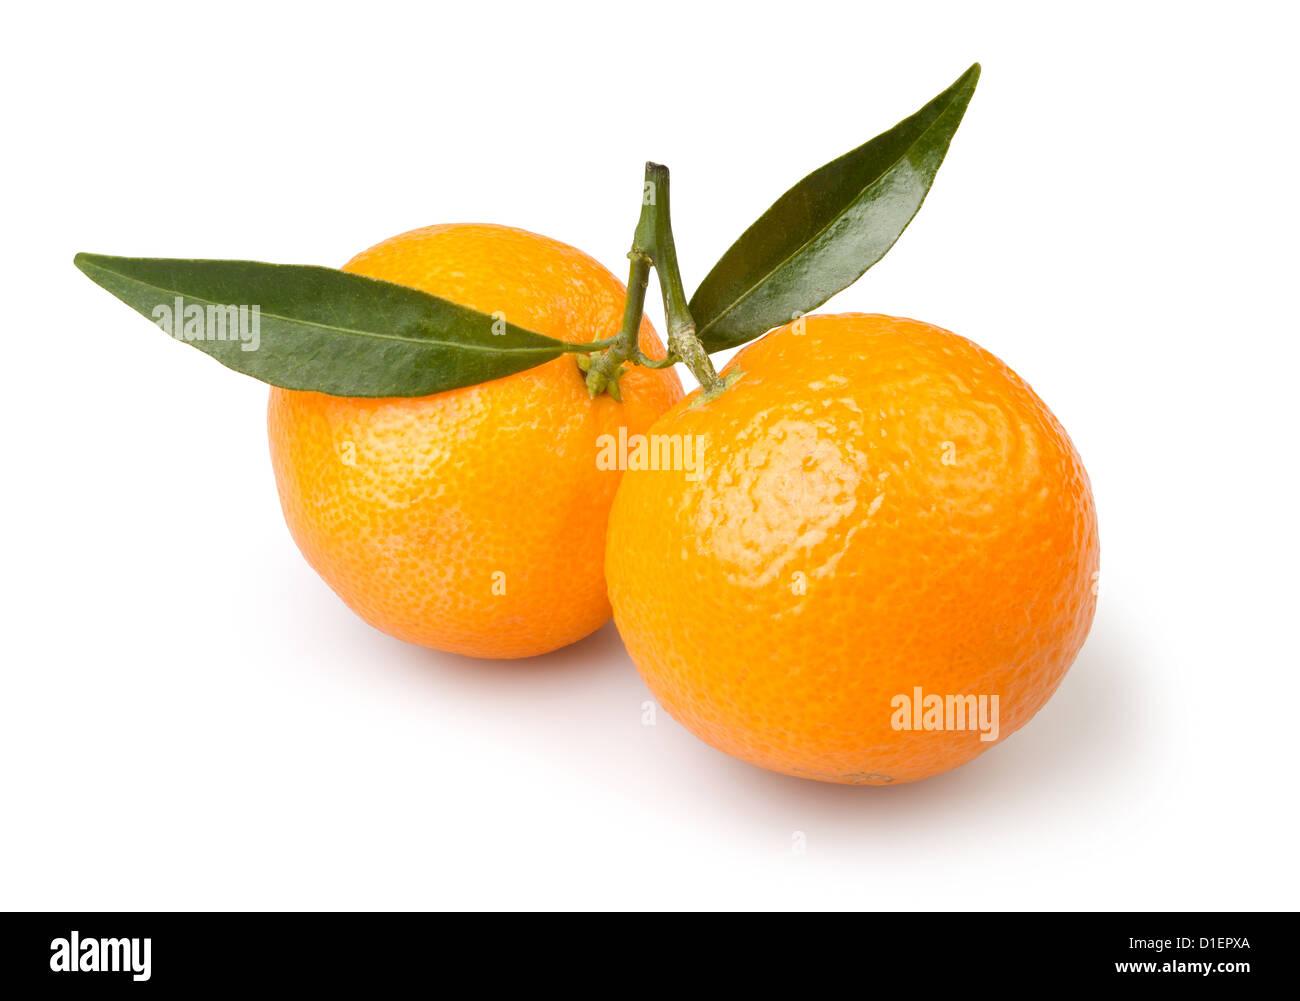 tangerine two on white background - Stock Image